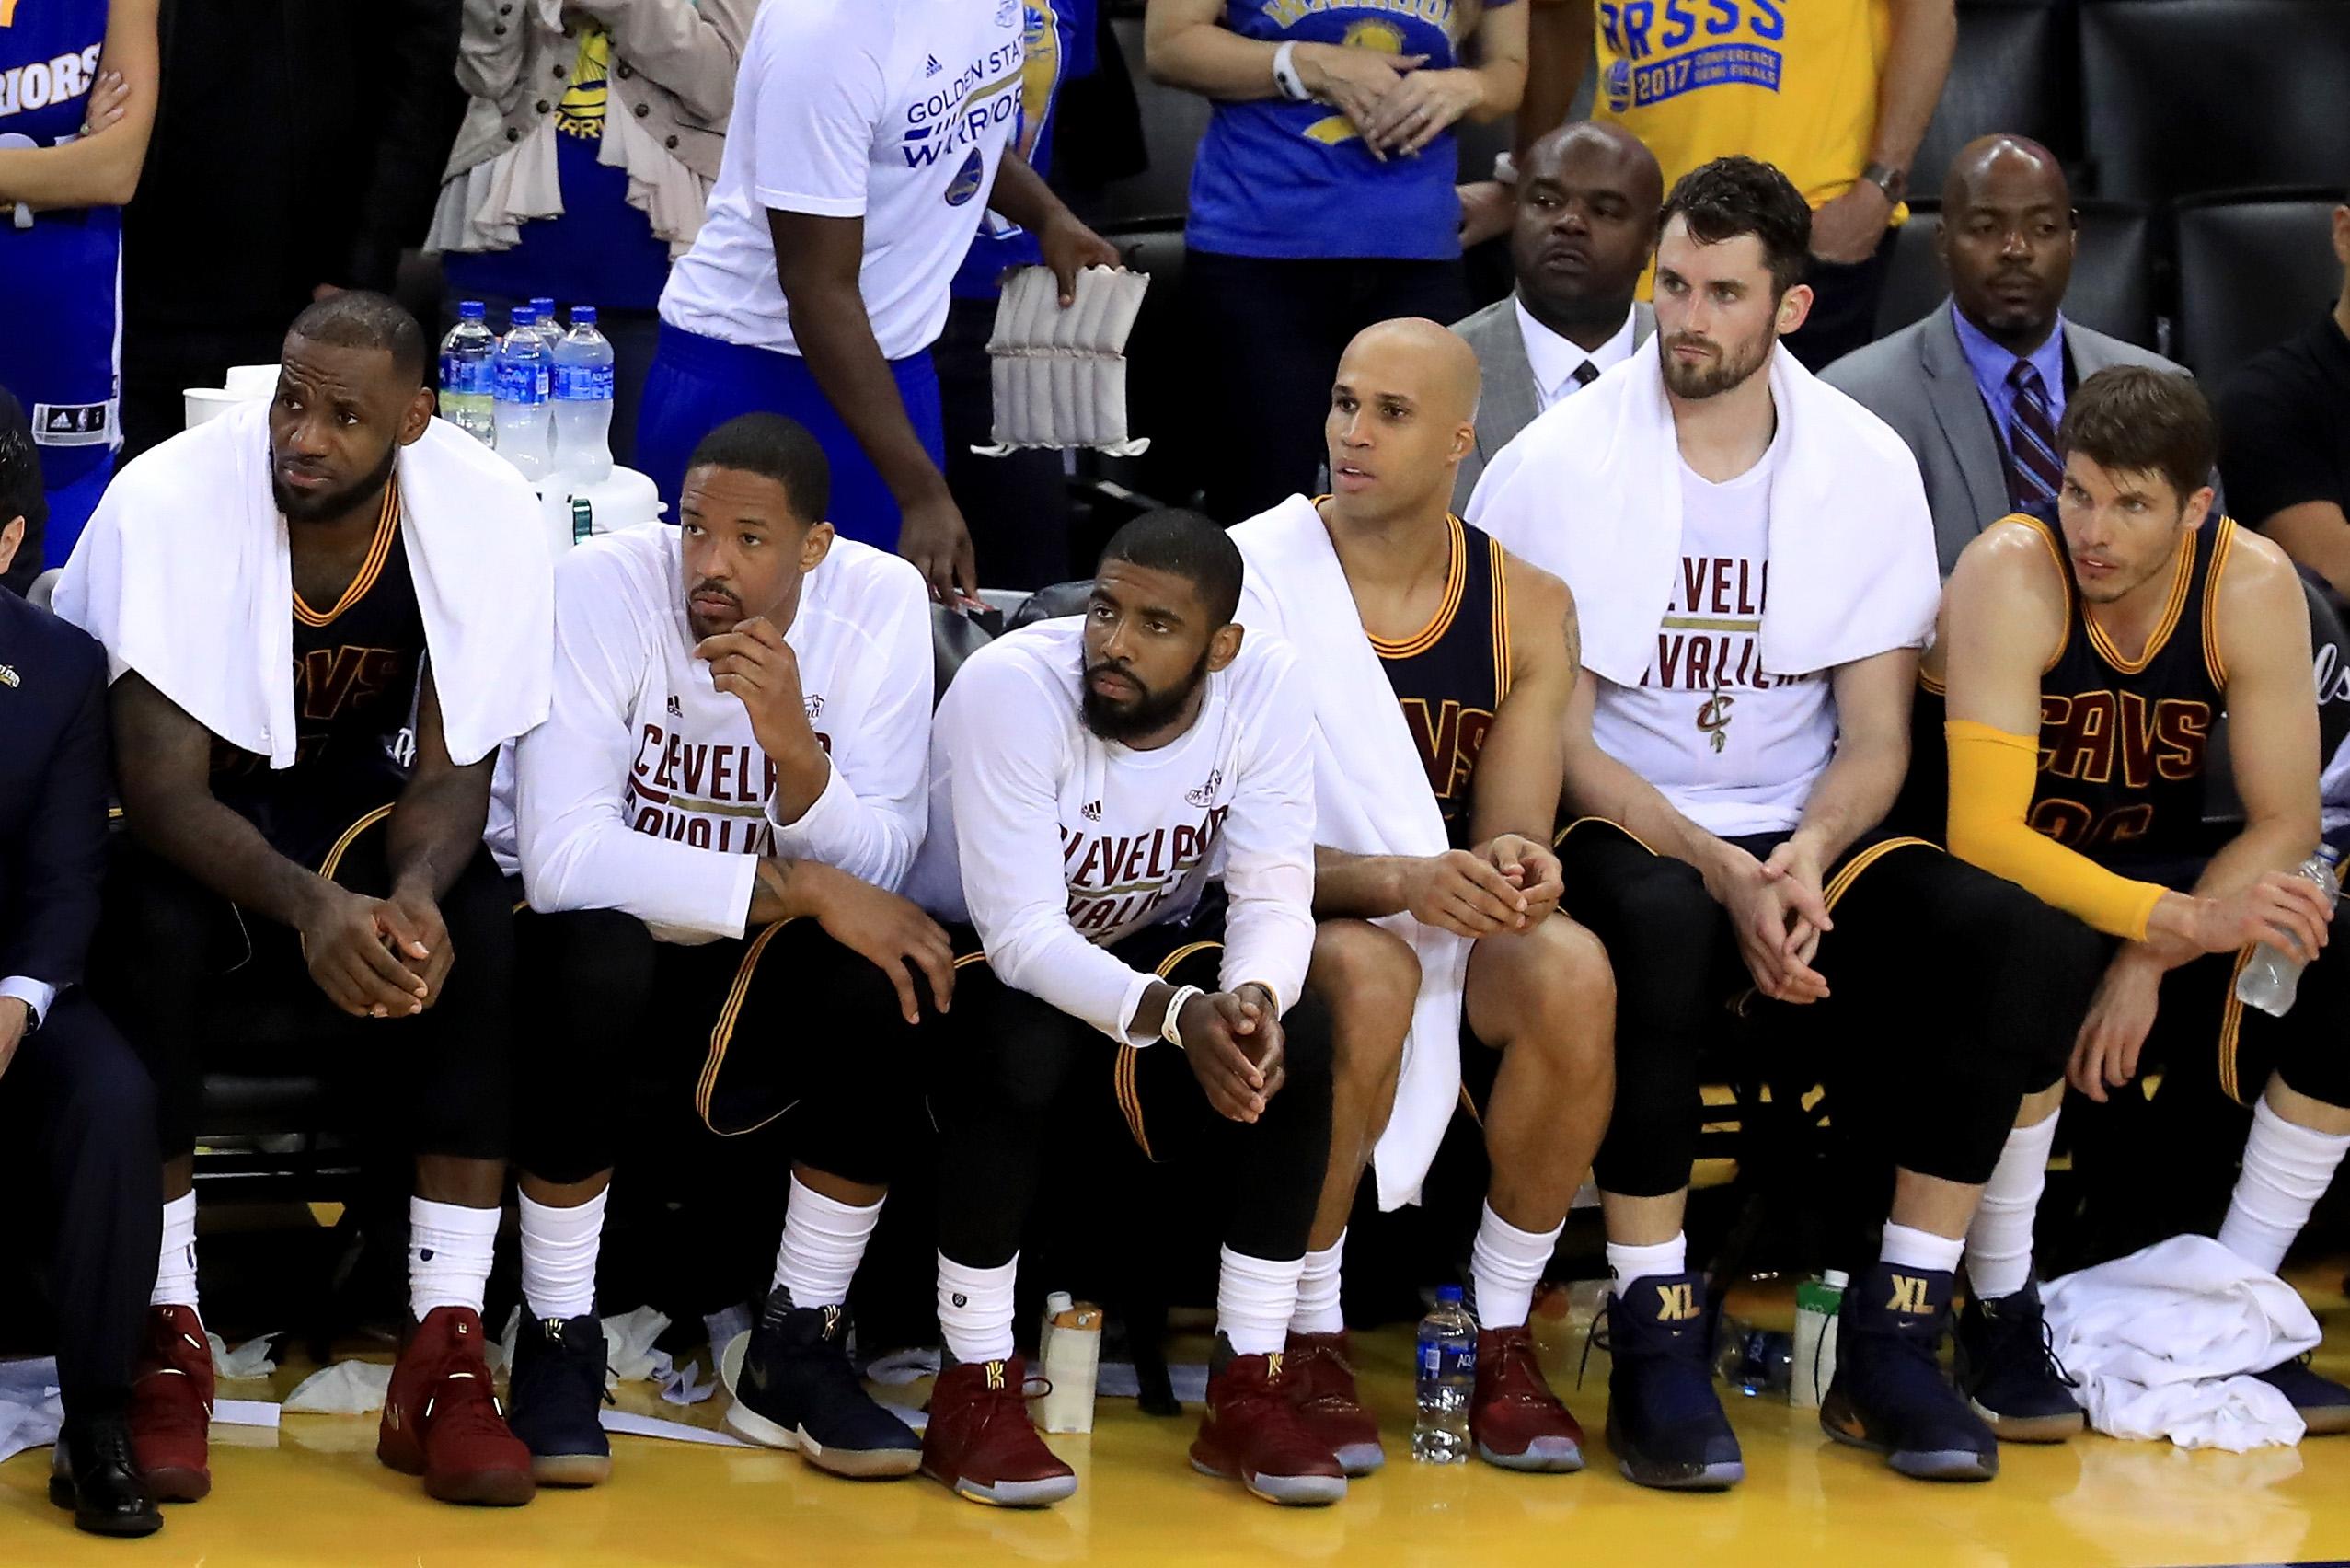 cavaliers nba finals, lebron james game 2, cavaliers game 2 keys to success, cavaliers vs. warriors